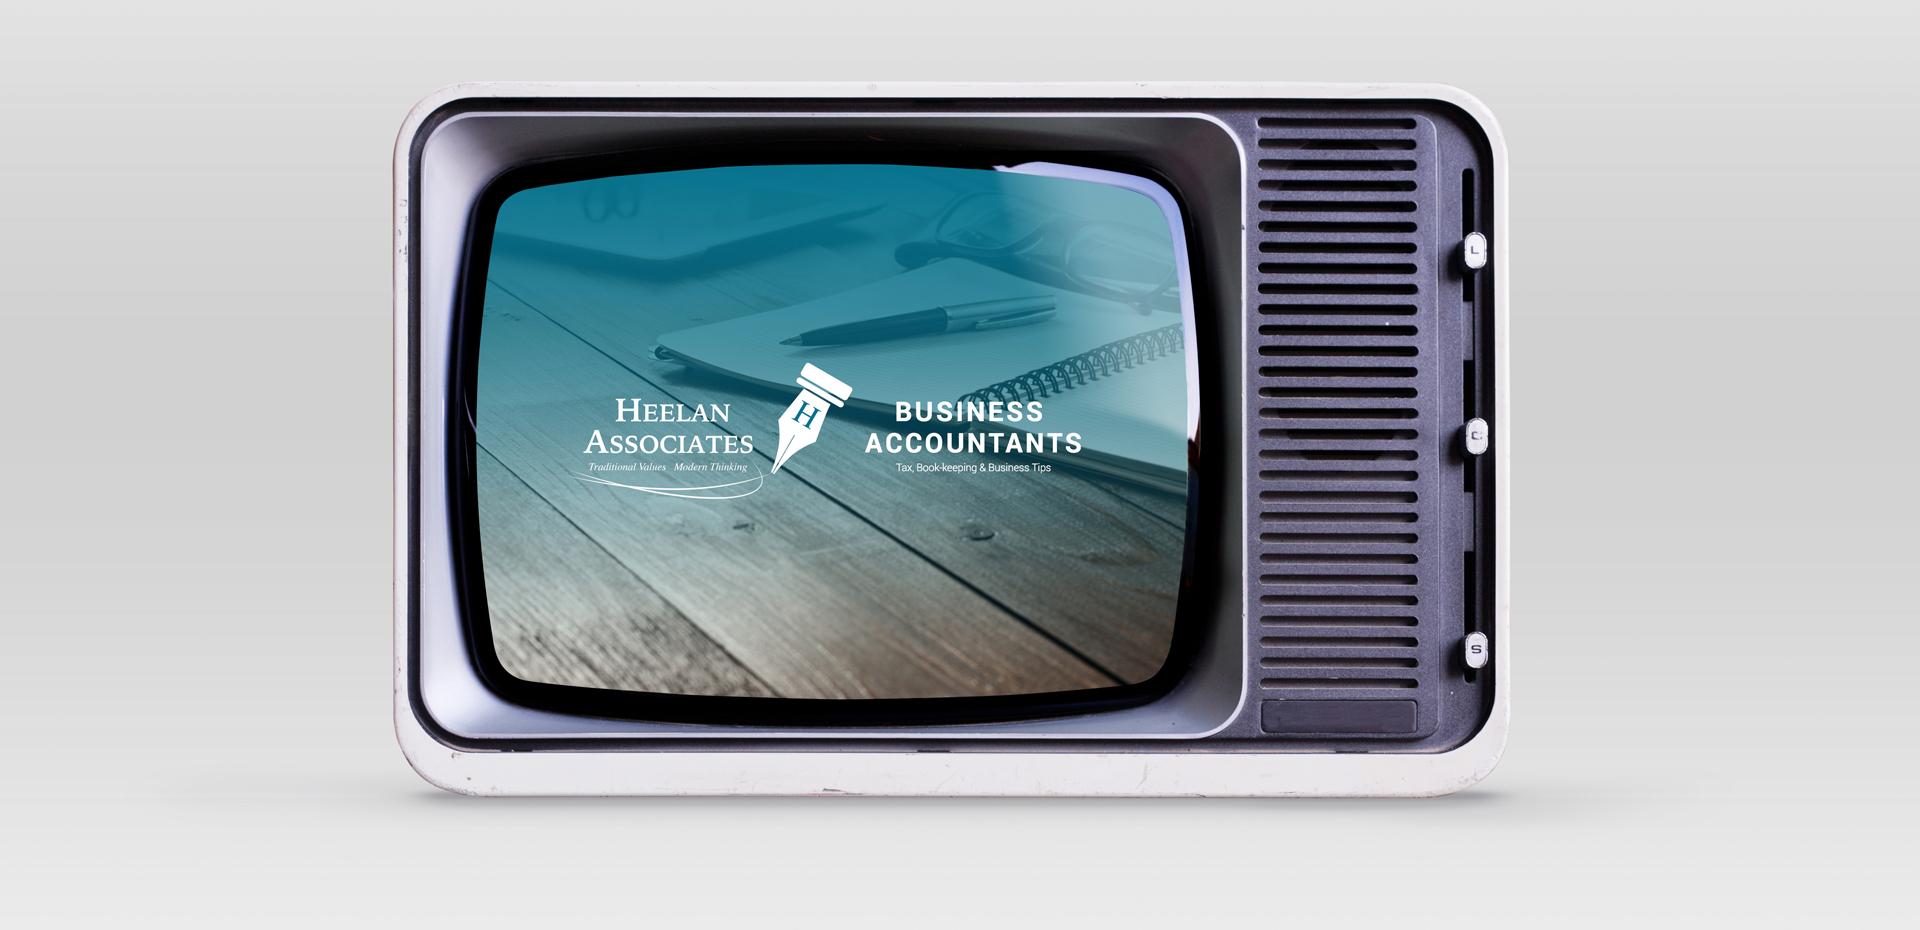 Heelan Associates Youtube Channel on a TV